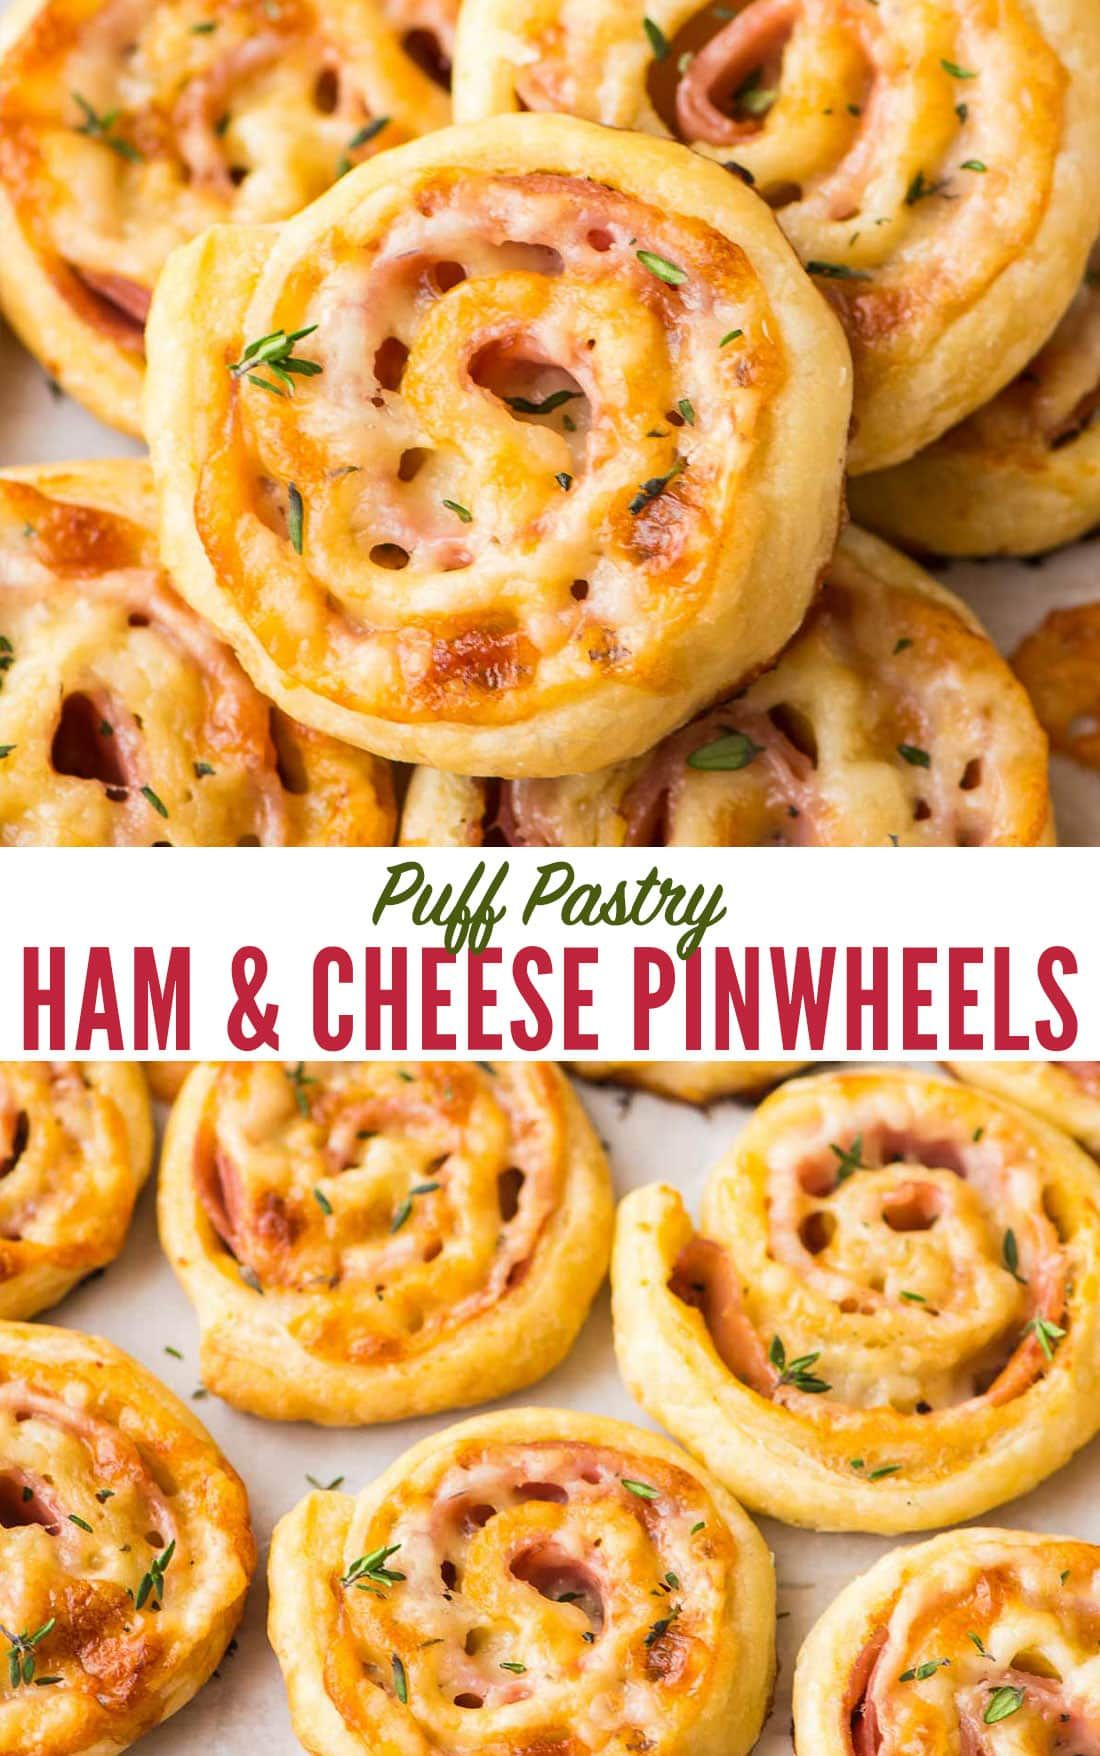 Photo of Ham and Cheese Pinwheels